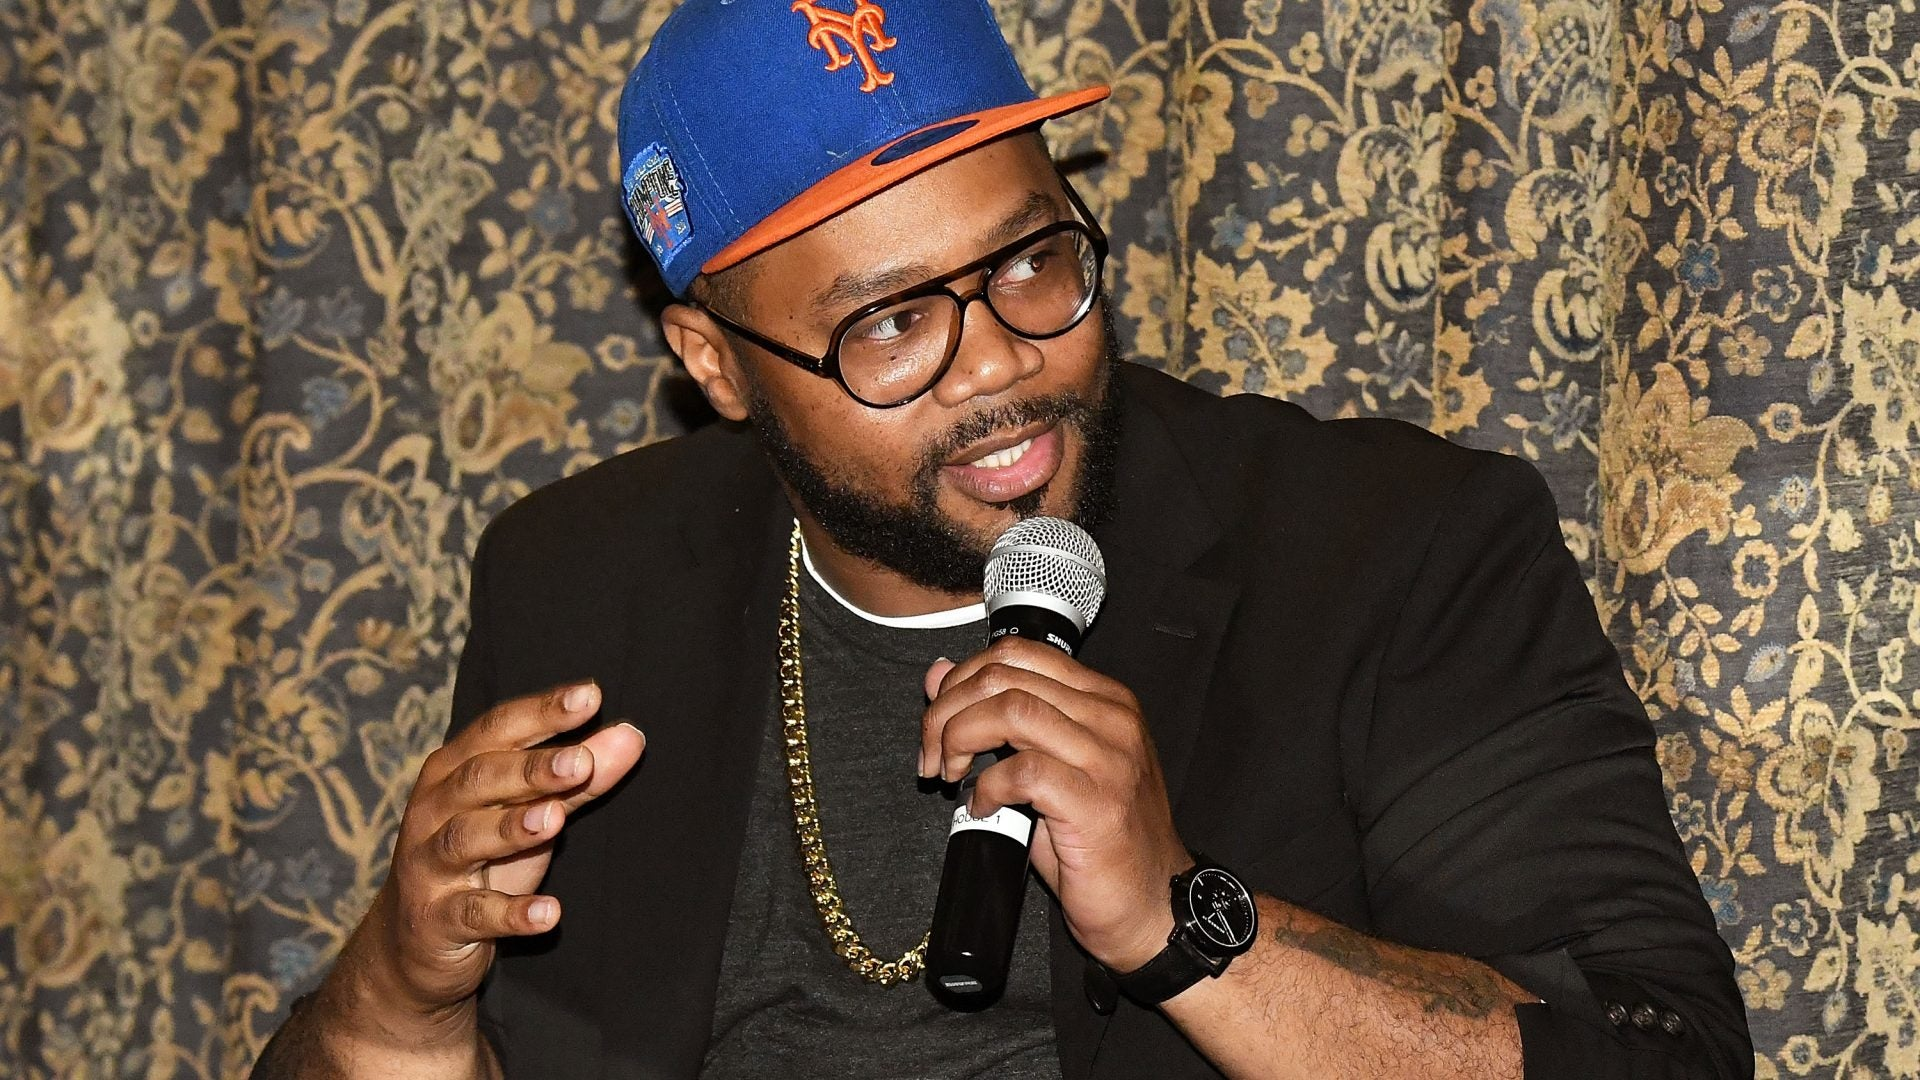 Women Accuse Writer Lamar 'Blogxilla' Valentine Of Sexual Misconduct